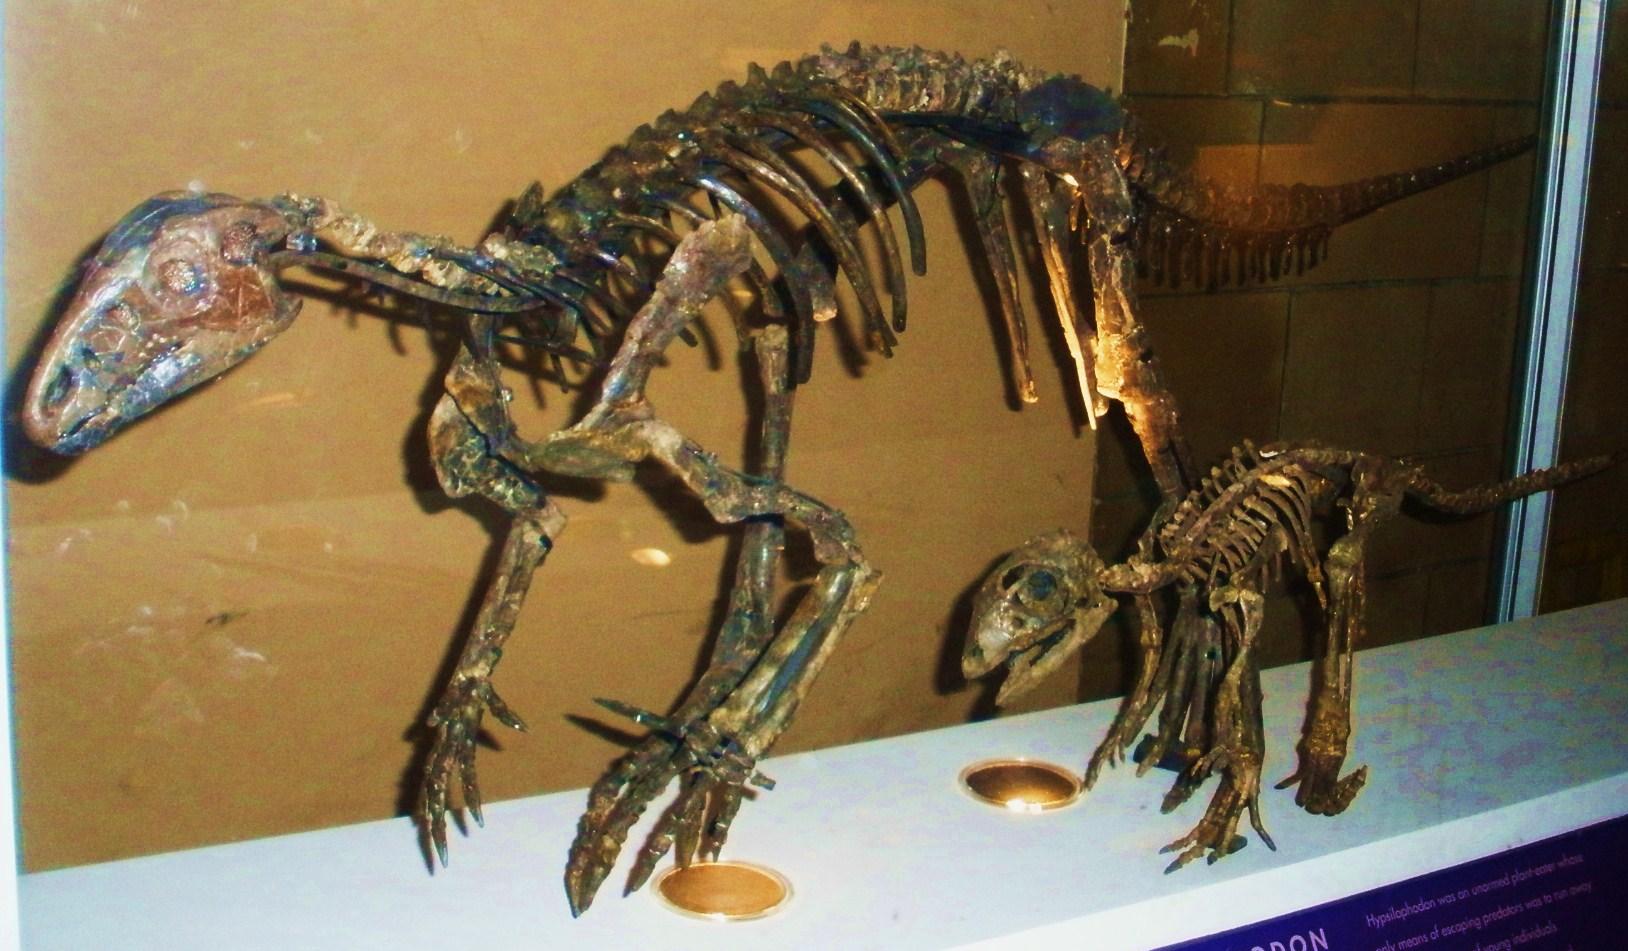 Qantassaurus  Dinopedia  FANDOM powered by Wikia